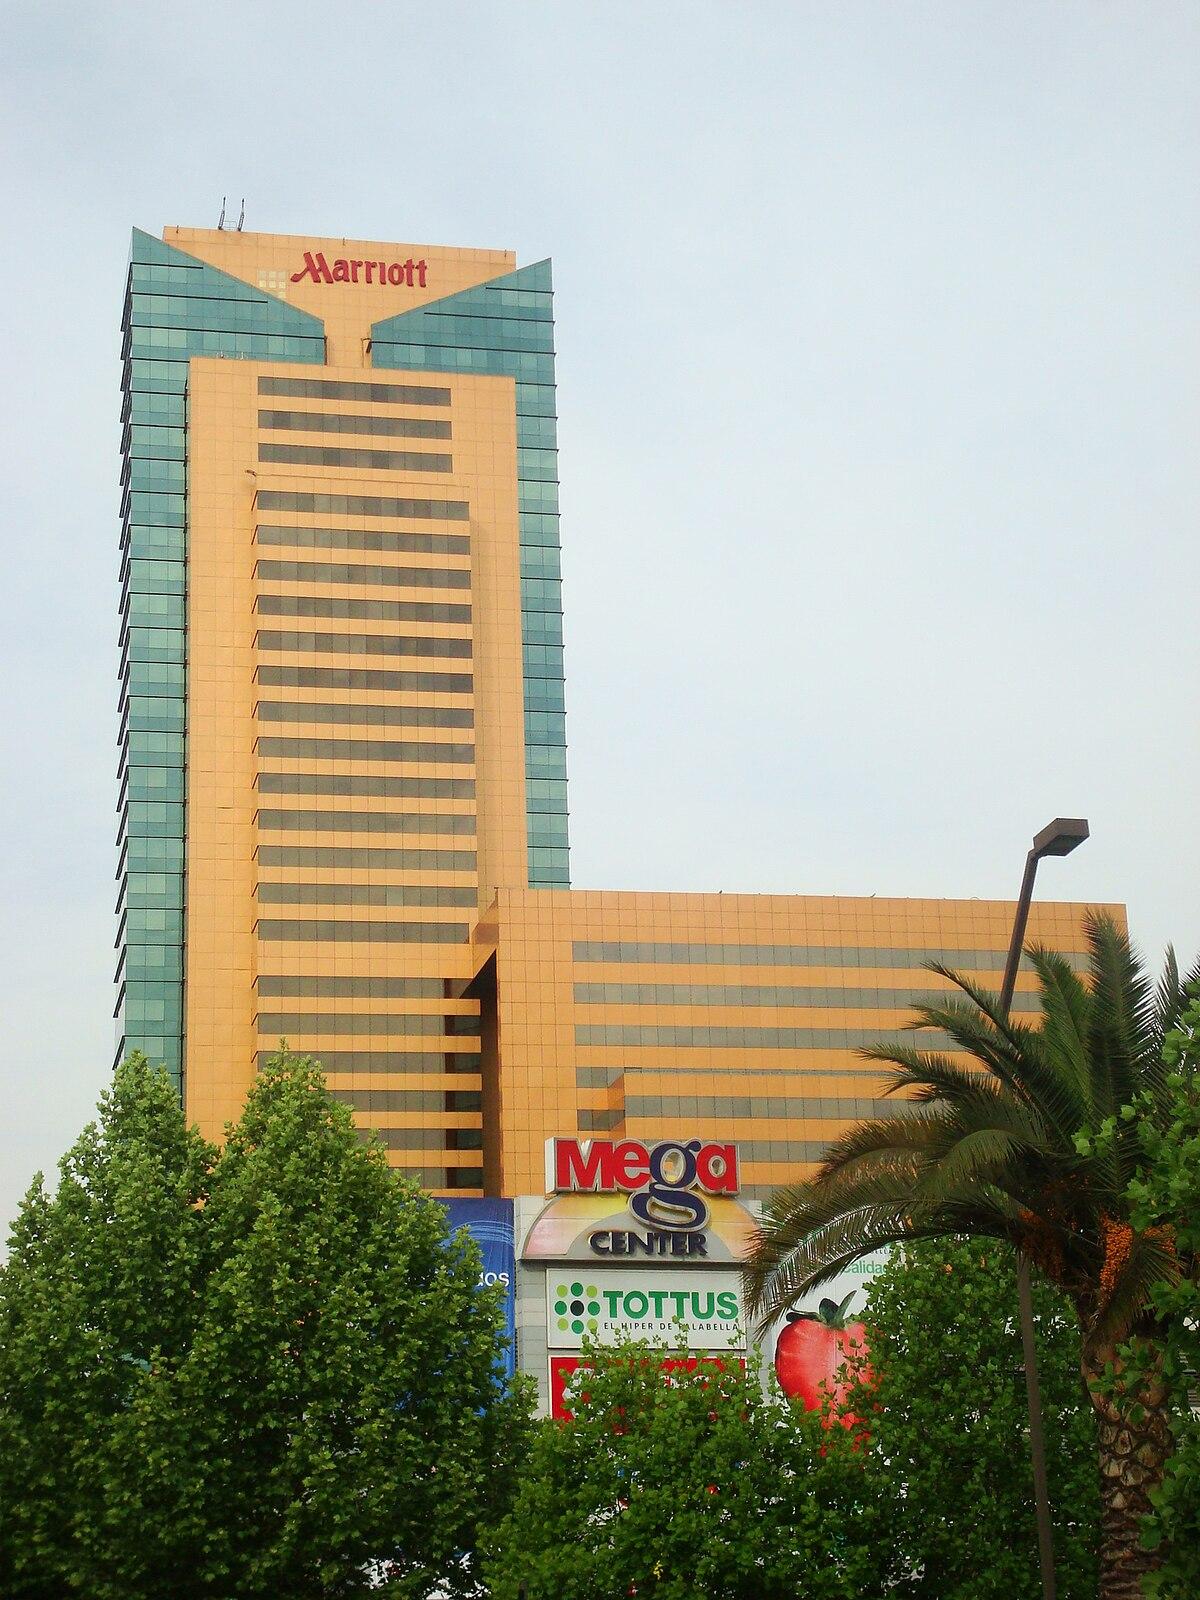 Marriott Hotel La Jolla